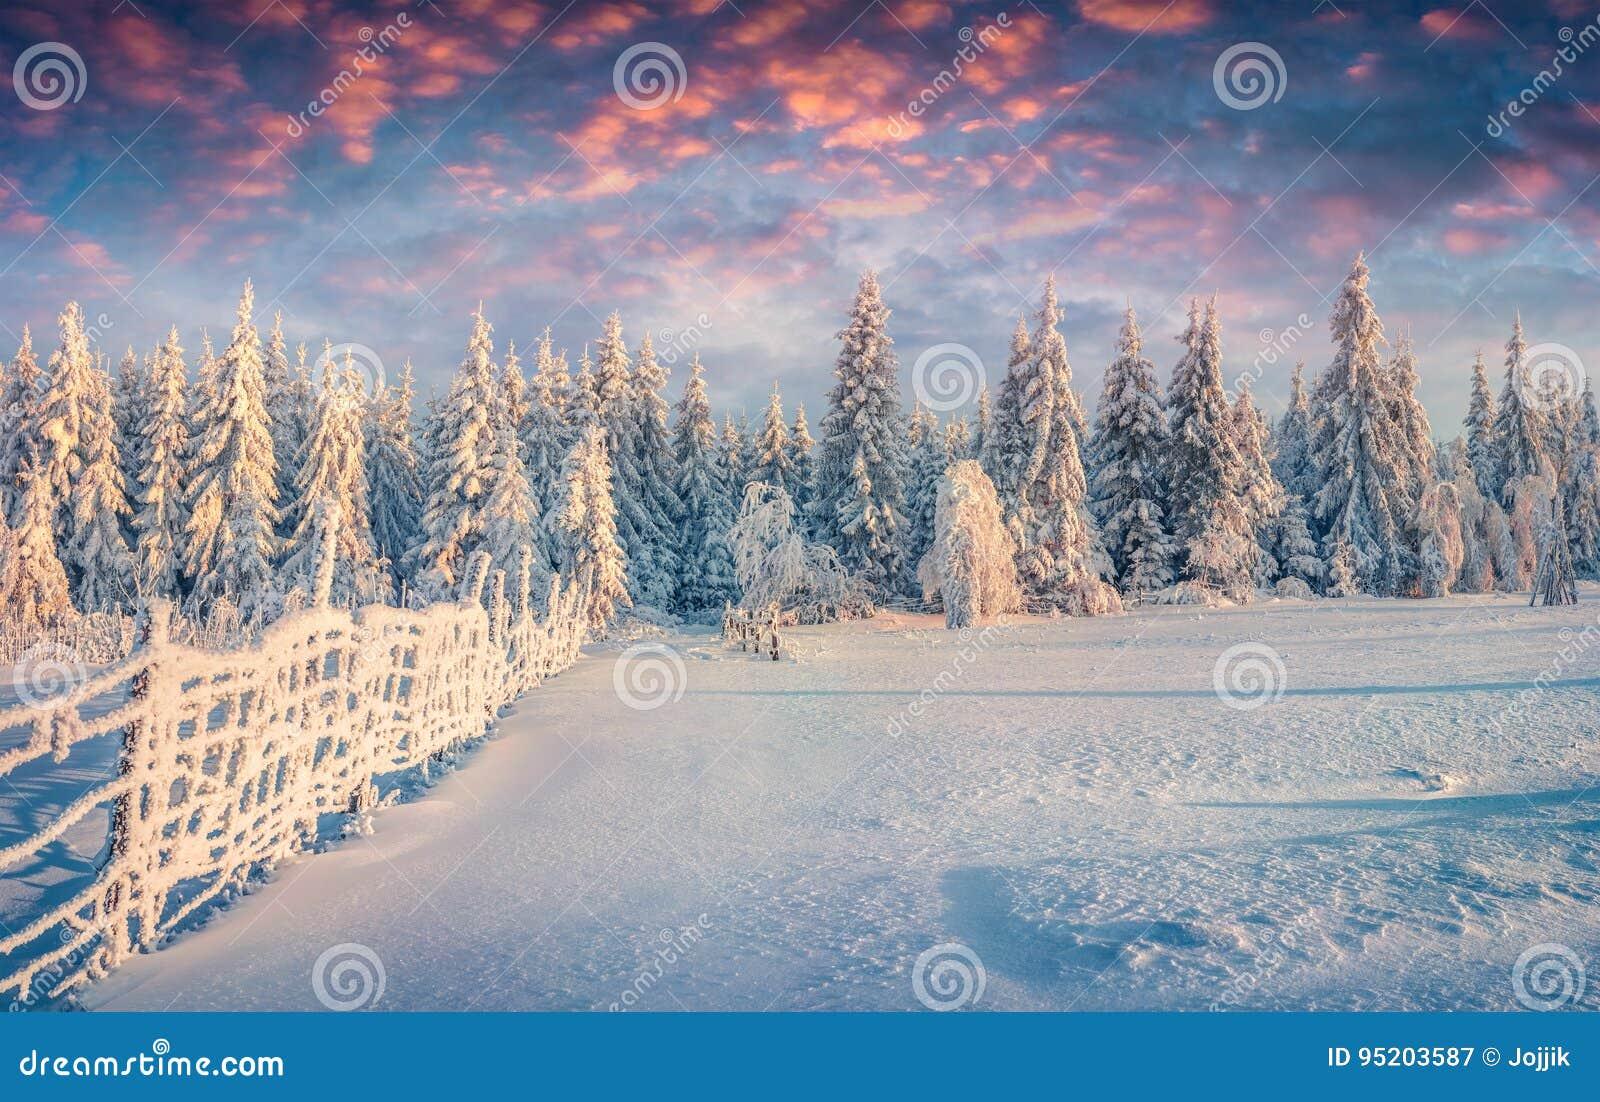 Splendid Christmas scene in the mountain forest at sunny morning